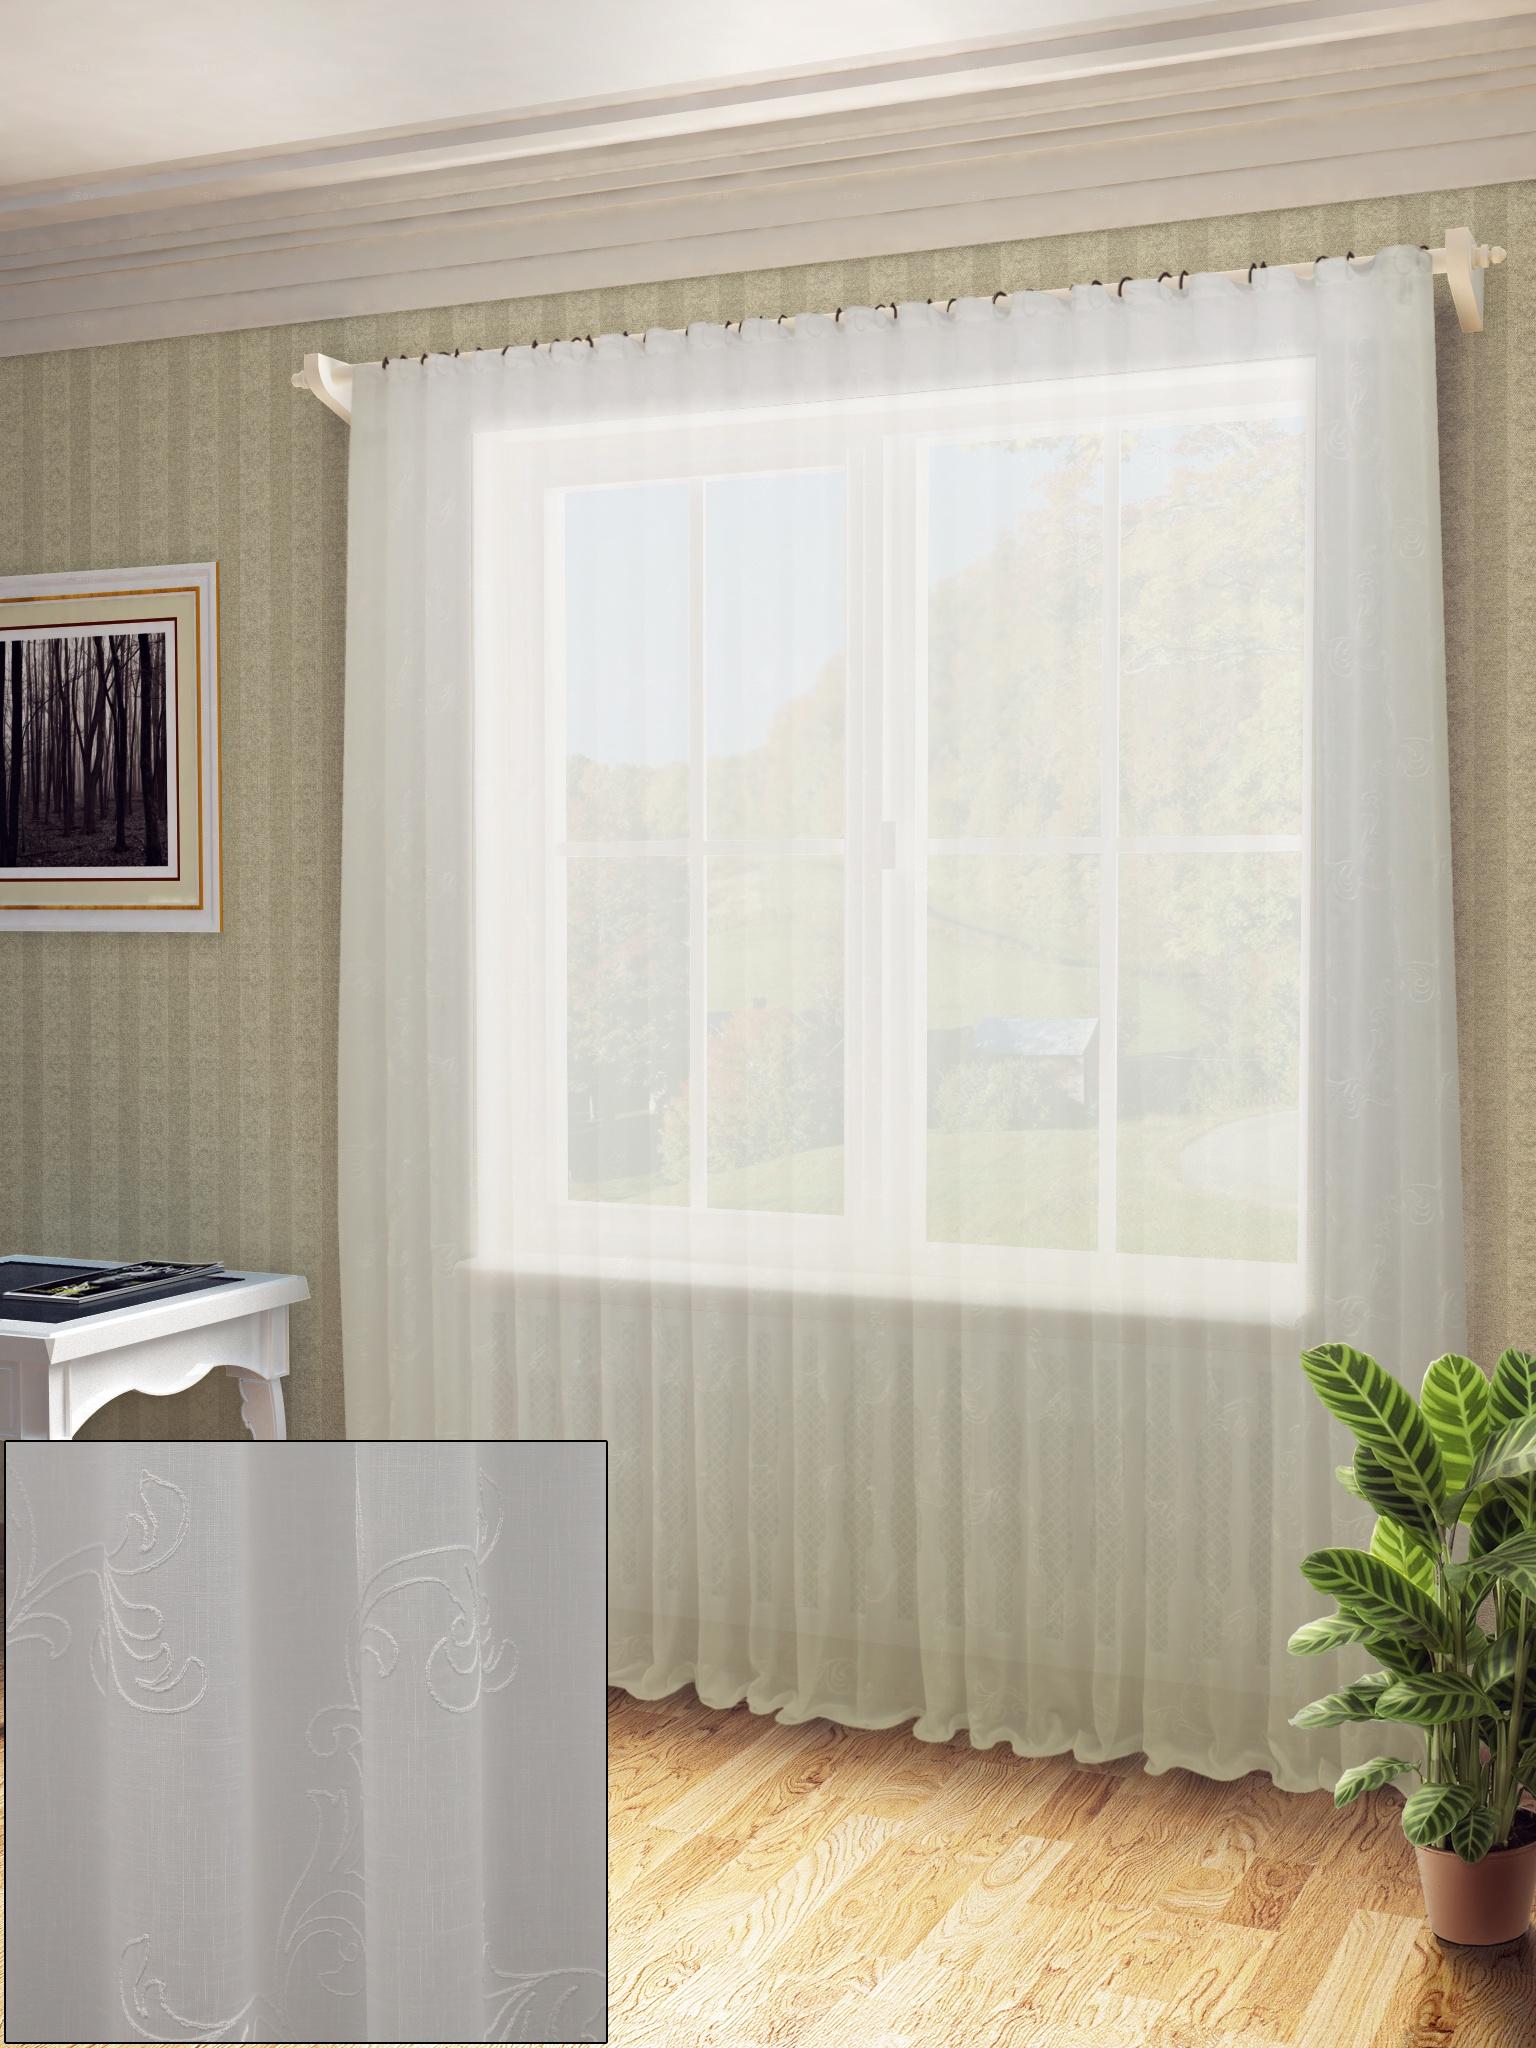 Тюль Sanpa Home Collection ДОРА, HP48641/A1/1E ДОРА, белый, белый, (300*260) тюль sanpa home collection альбертина hp18520 120 1e альбертина белый белый 300 120